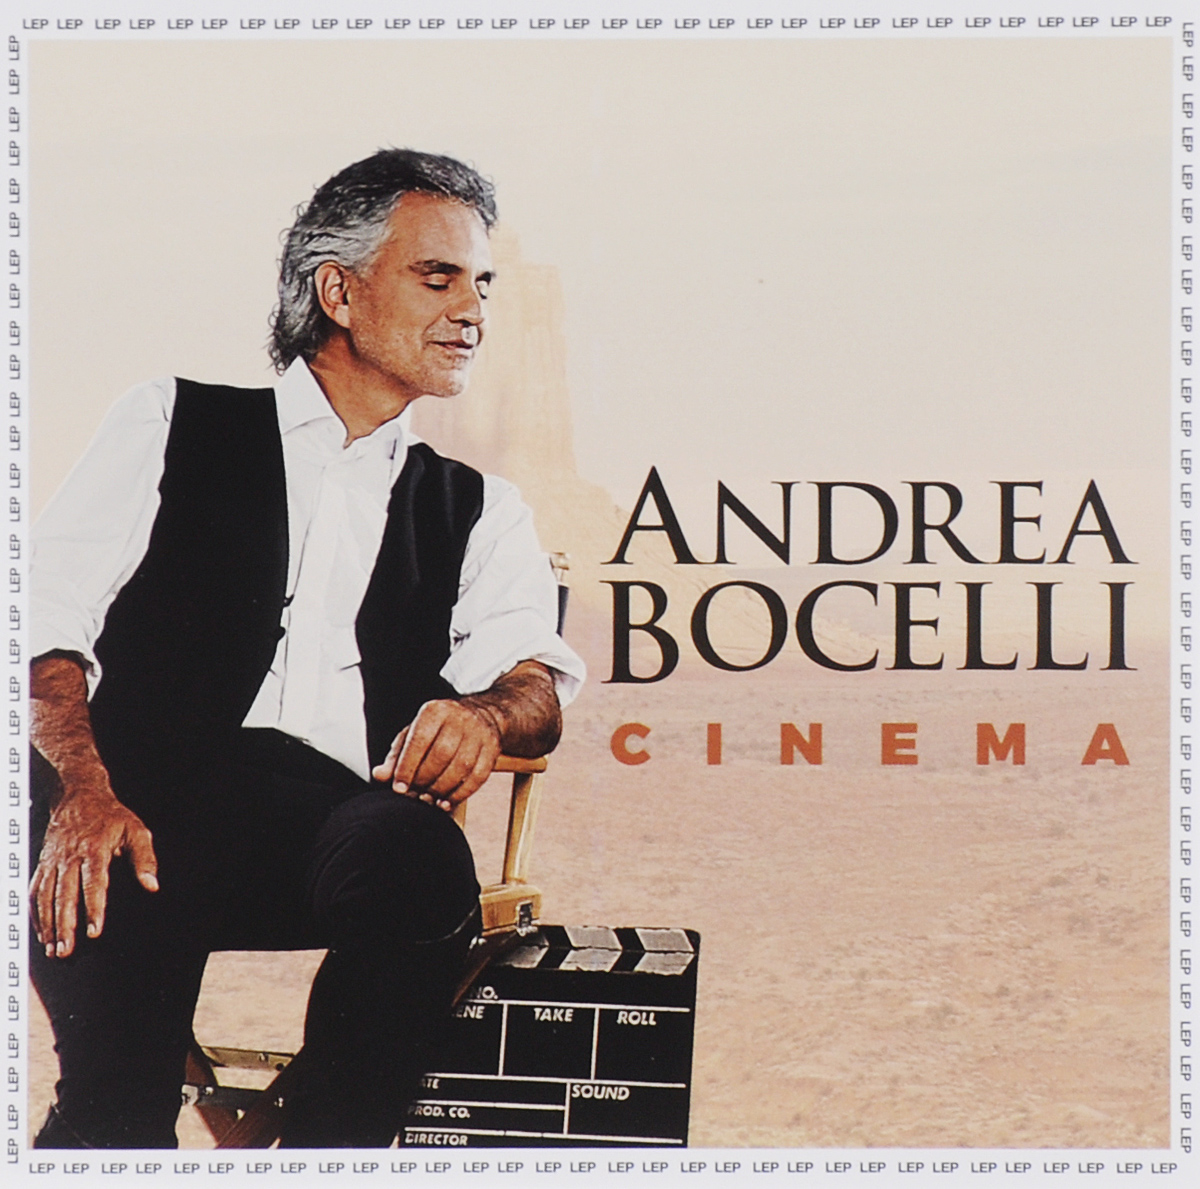 Андреа Бочелли Andrea Bocelli. Cinema андреа бочелли andrea bocelli cinema limited edition 2 lp